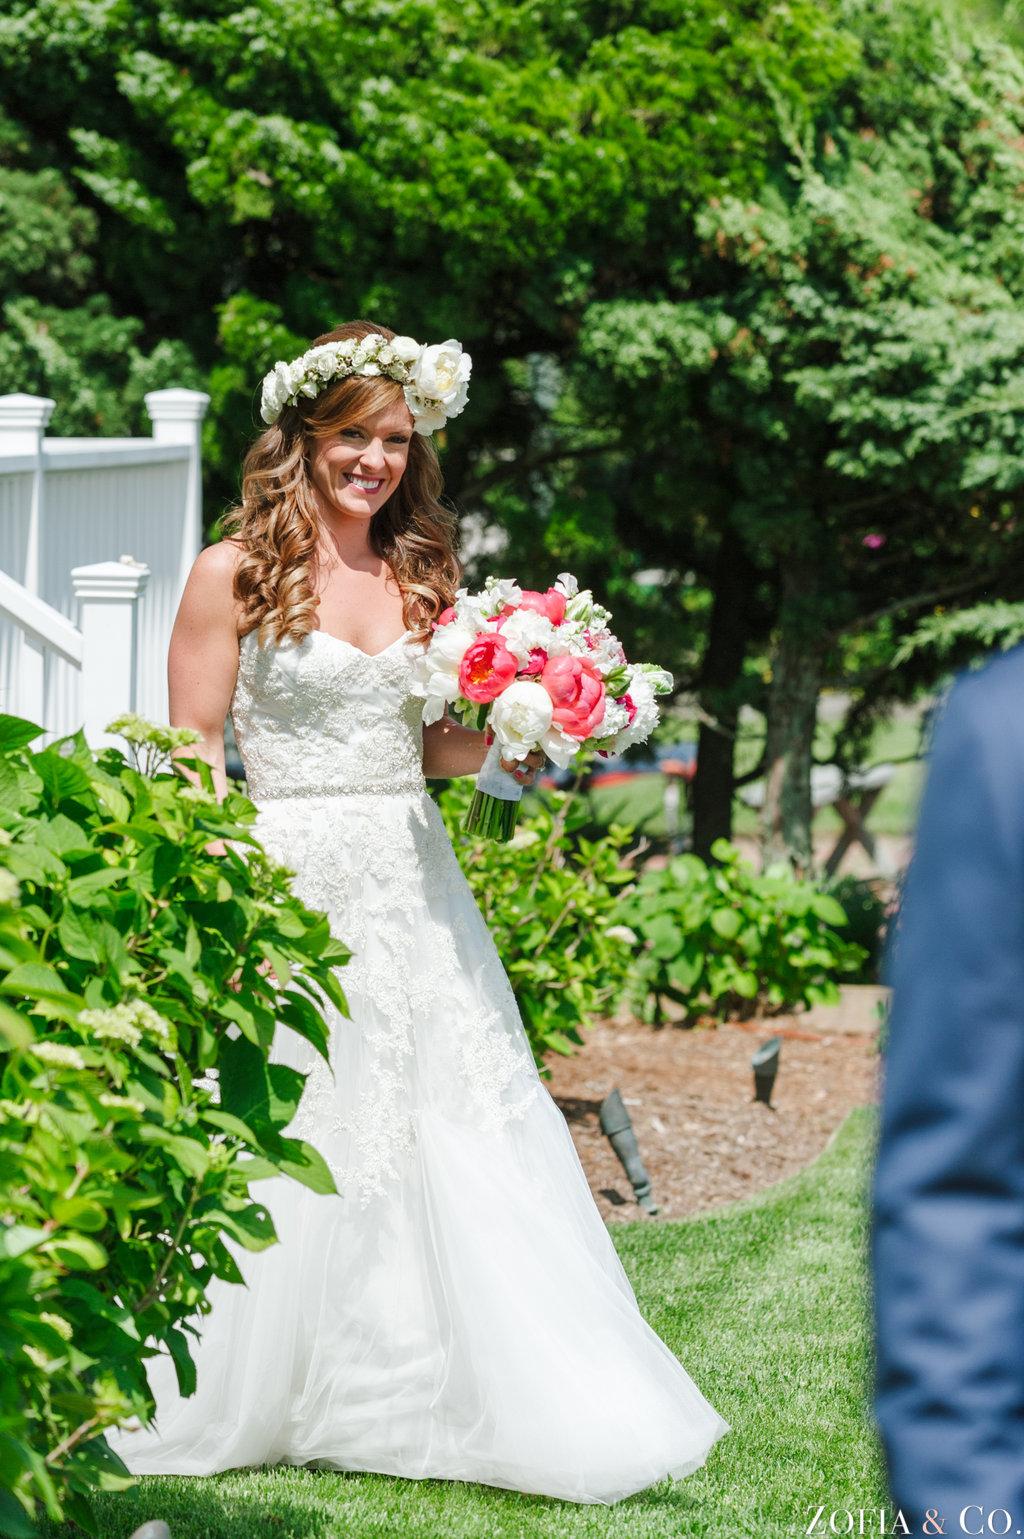 Ceci_New_York_Style_Luxury_Custom_Summer_Wedding_CeciBride_Nautical_Blue_Gold_Letterpress_Foil_30.jpg